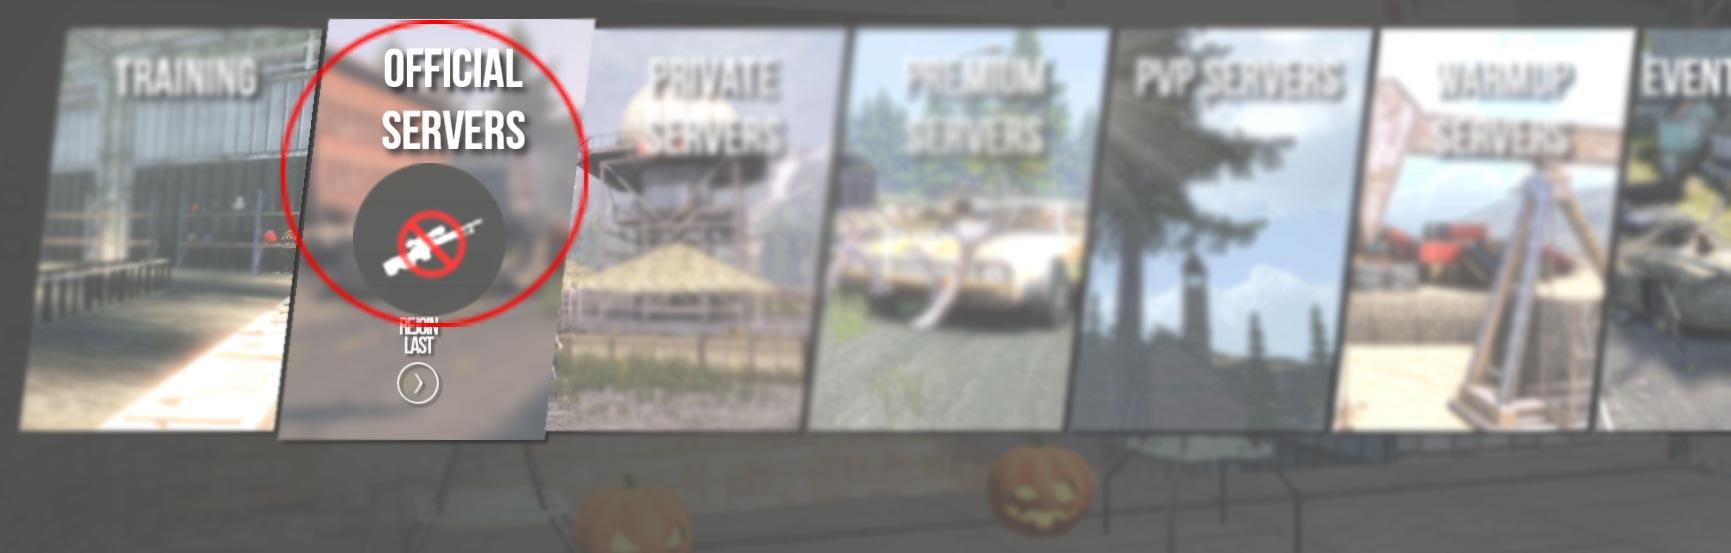 grenades-to-non-sniper-servers.jpg